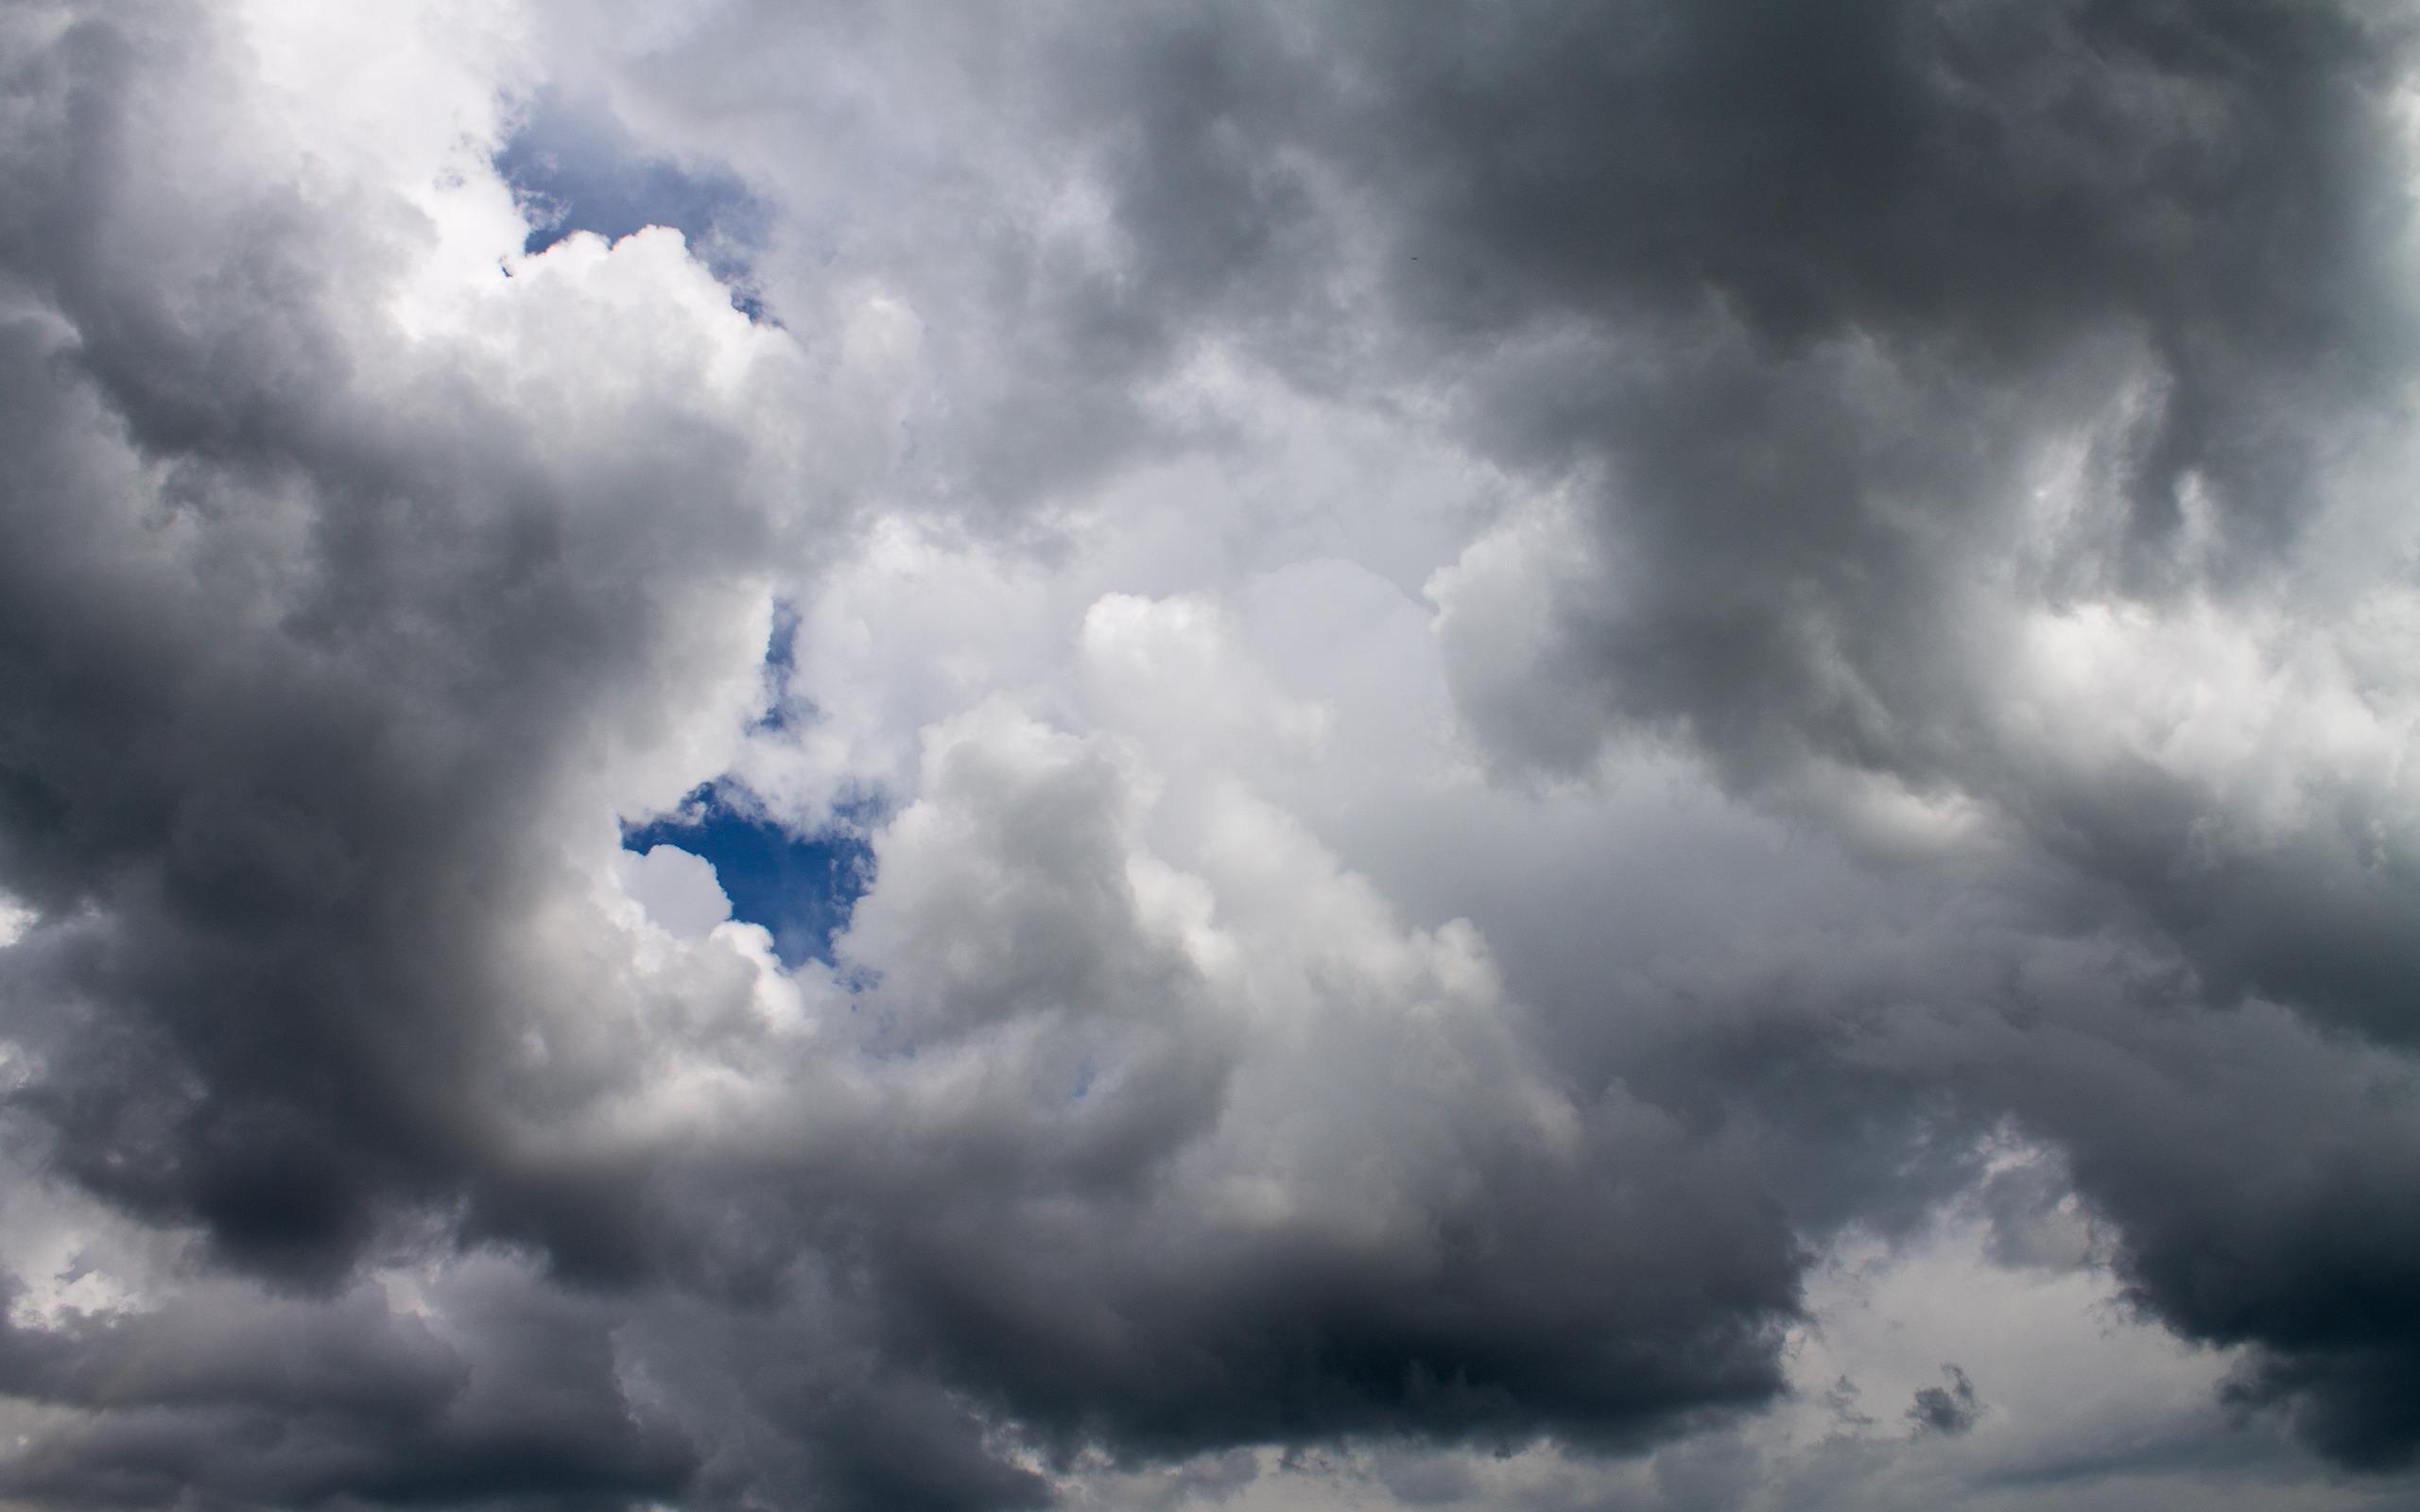 clouds wallpaper storm hd desktop wallpapers 4k hd